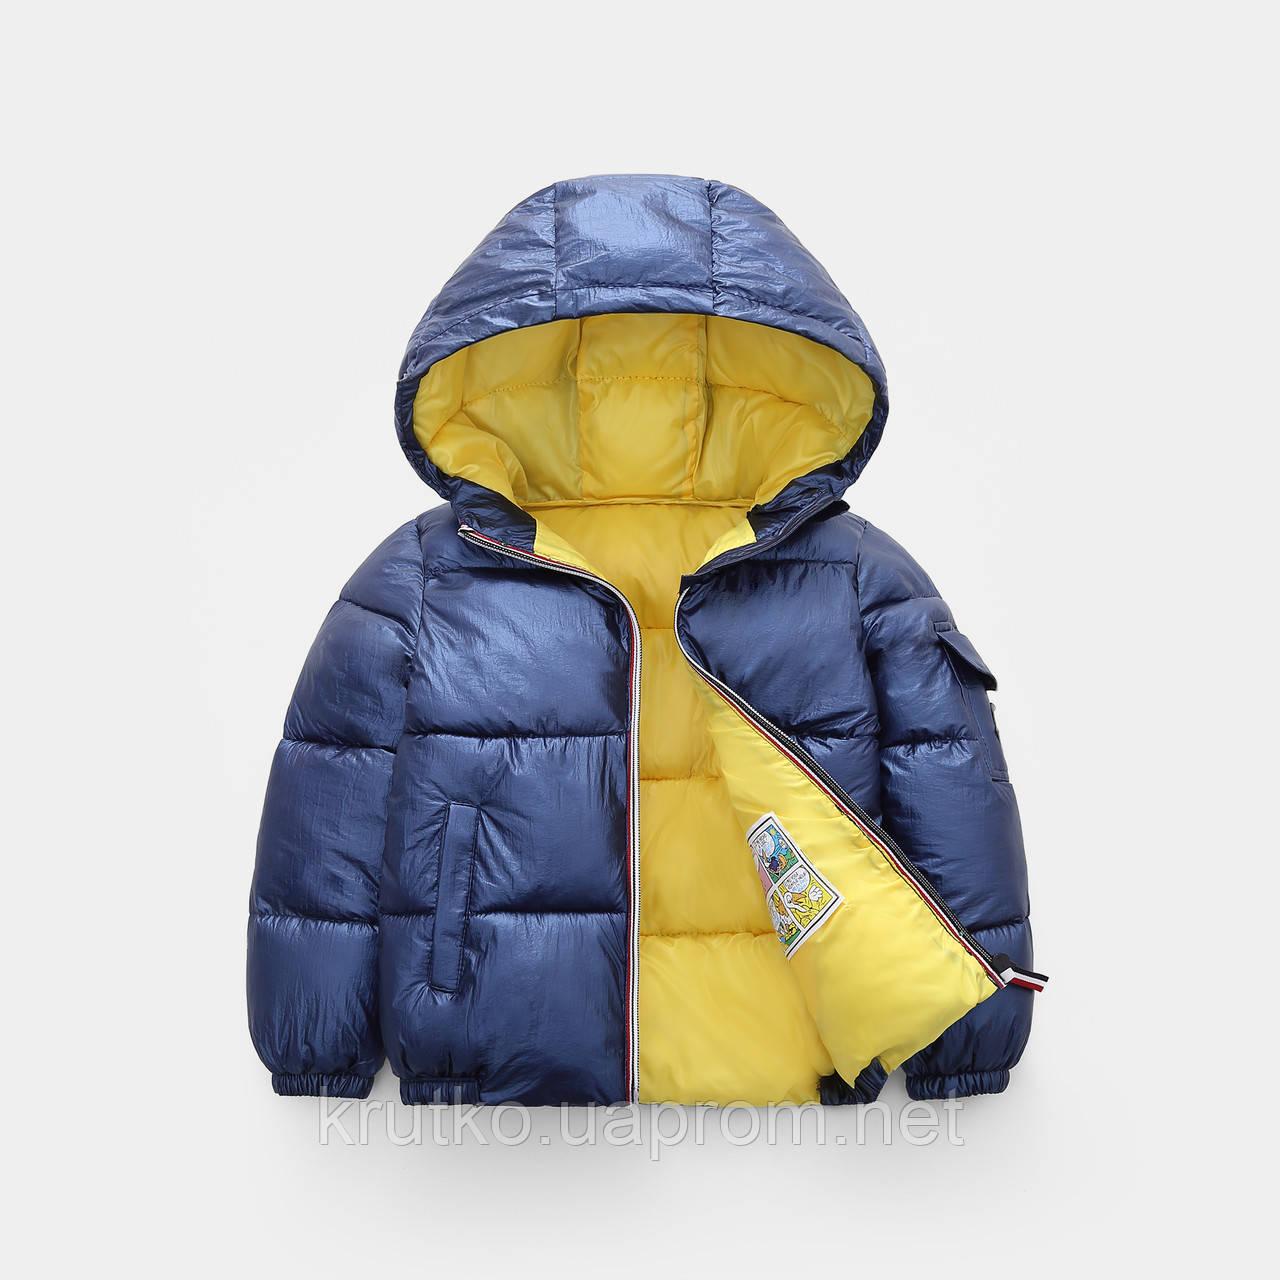 Куртка демисезонная для мальчика Глянец, синий Berni